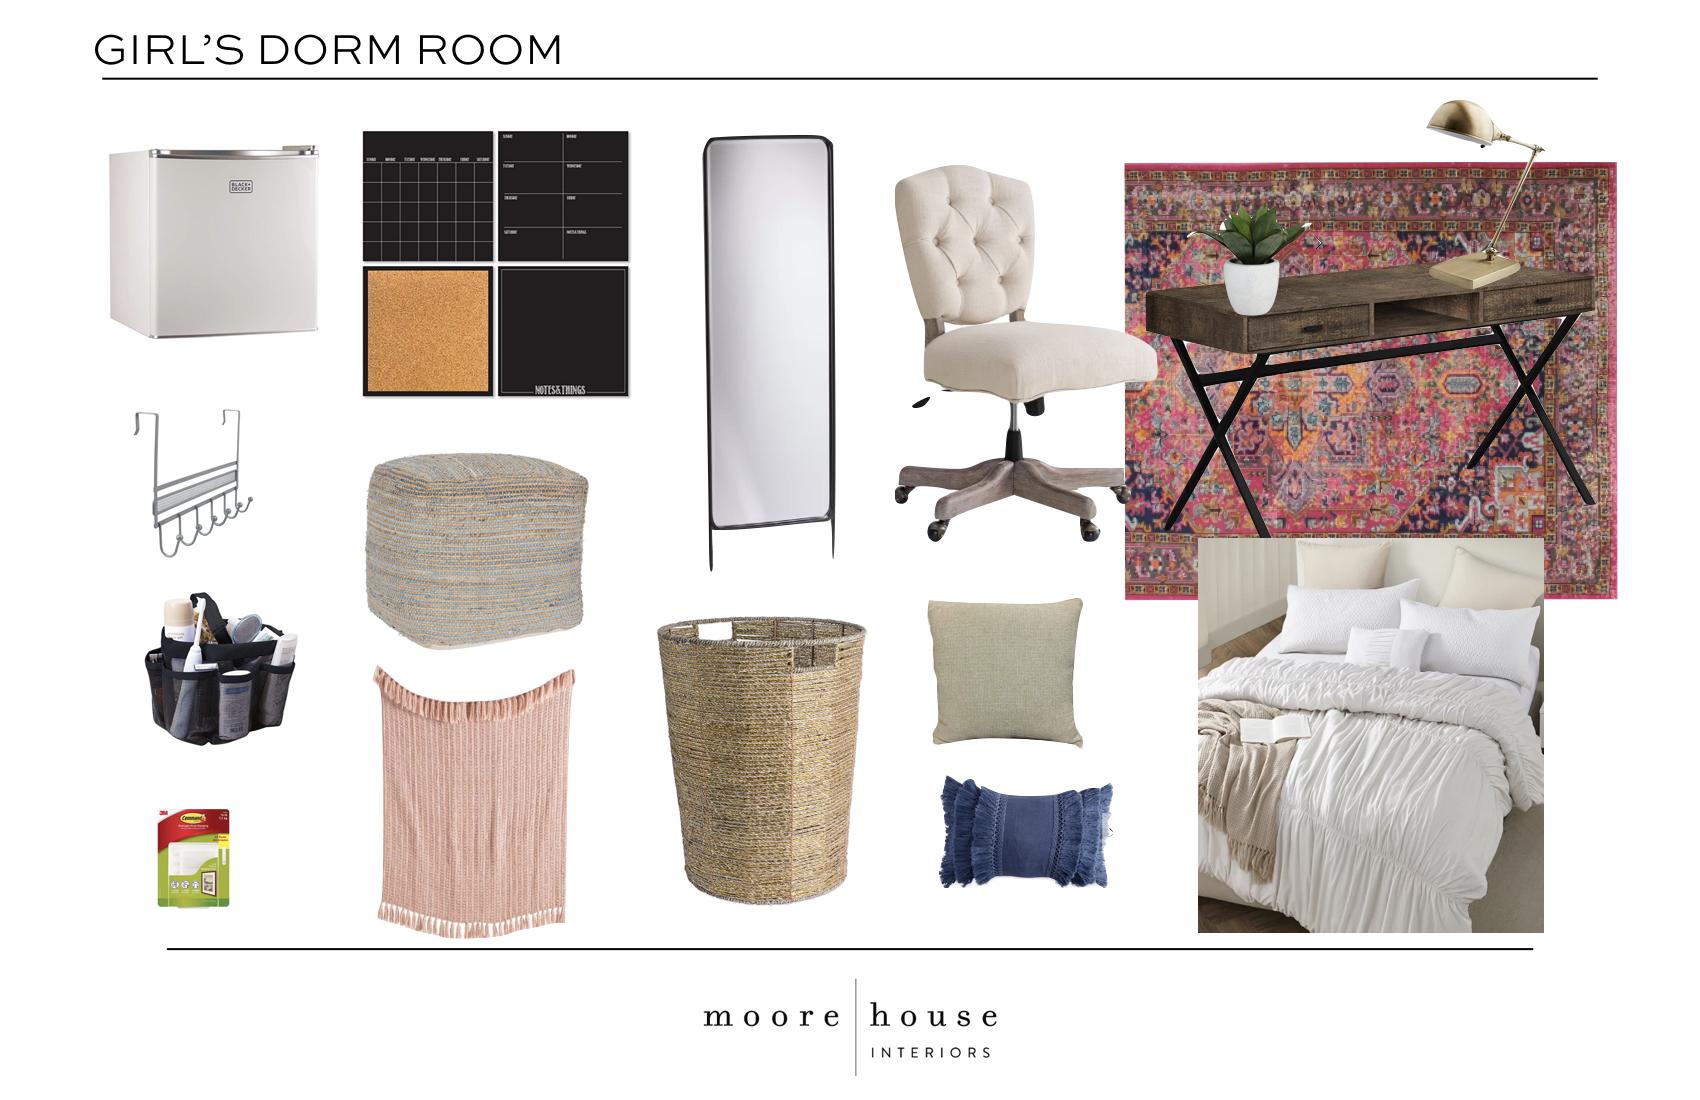 FF Girl's Dorm Room.001.jpeg